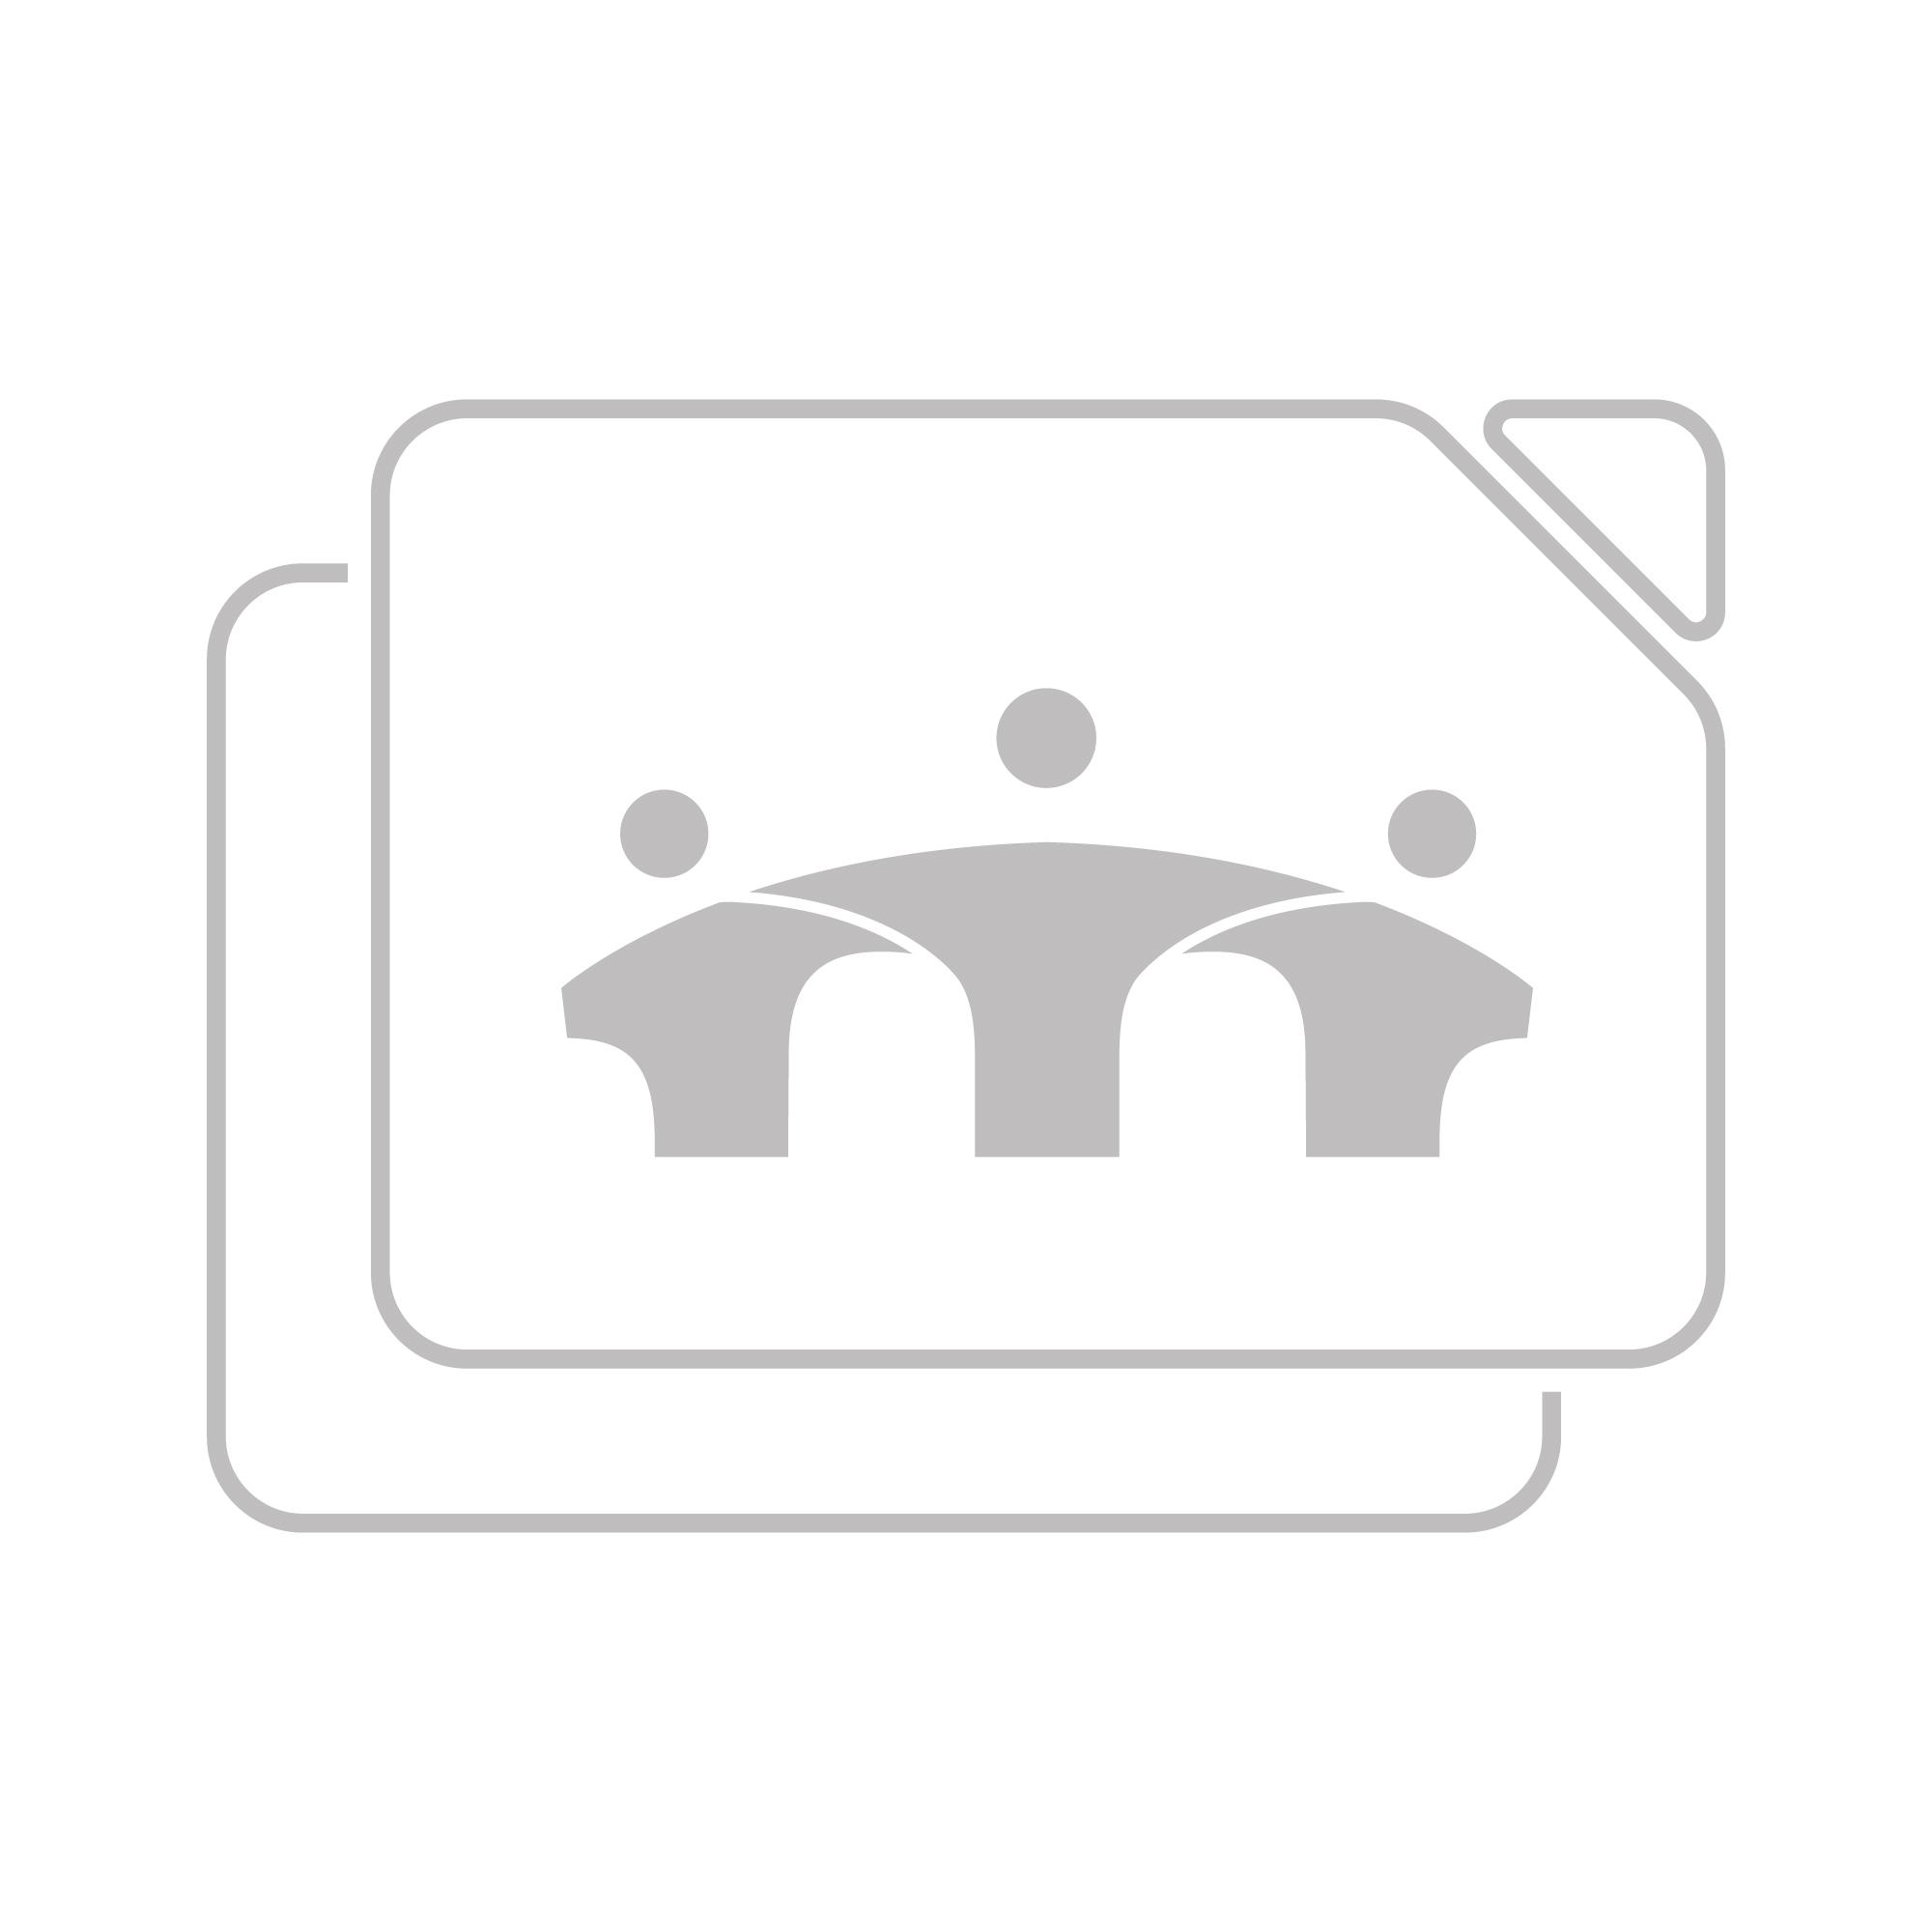 Logitech K380 for Mac Multi-Device Bluetooth Keyboard - ROSE - FRA - CENTRAL